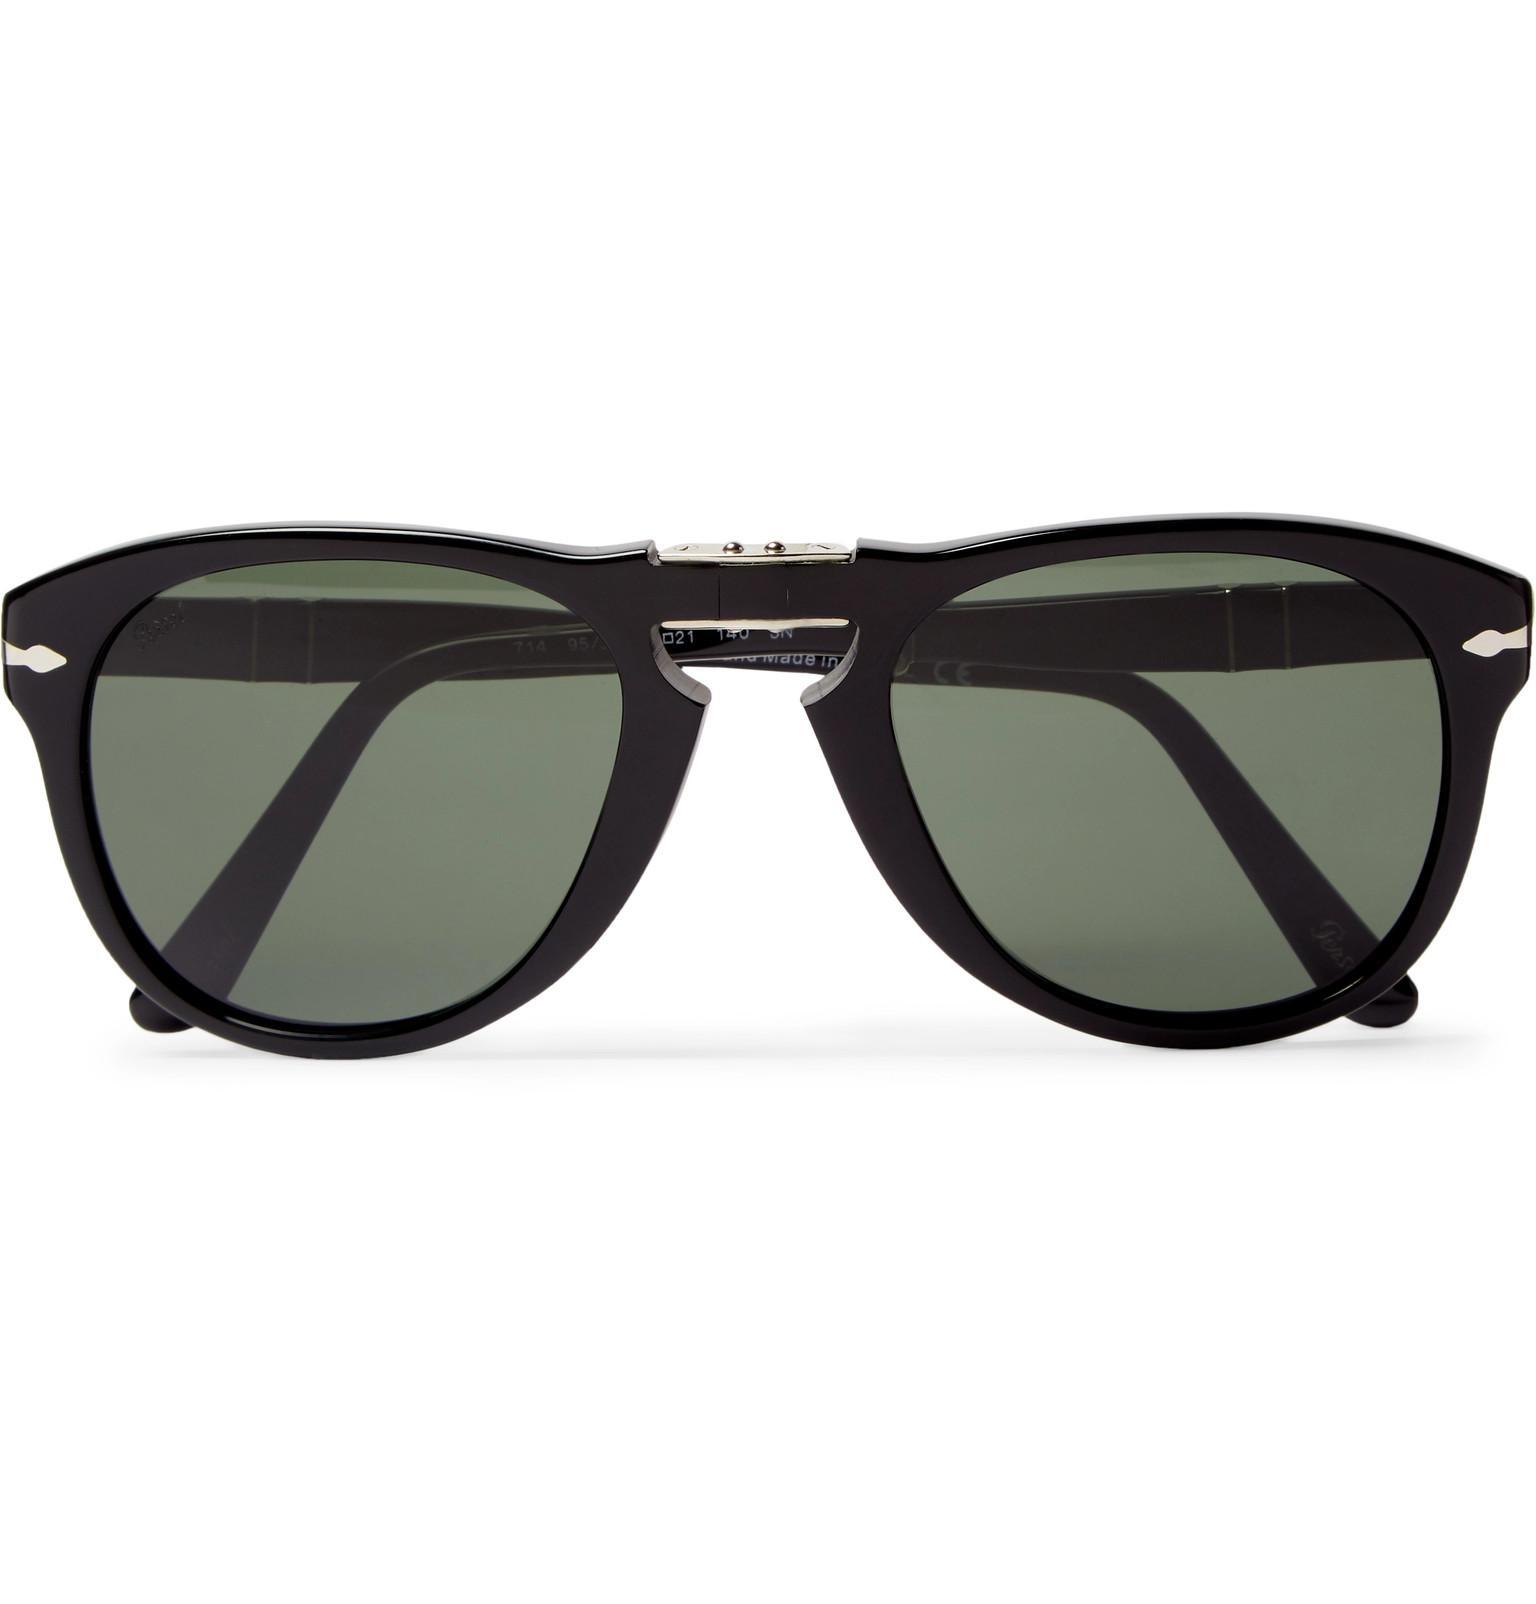 0fc4431f3d Persol 714 Folding D-frame Acetate Sunglasses in Black for Men - Lyst